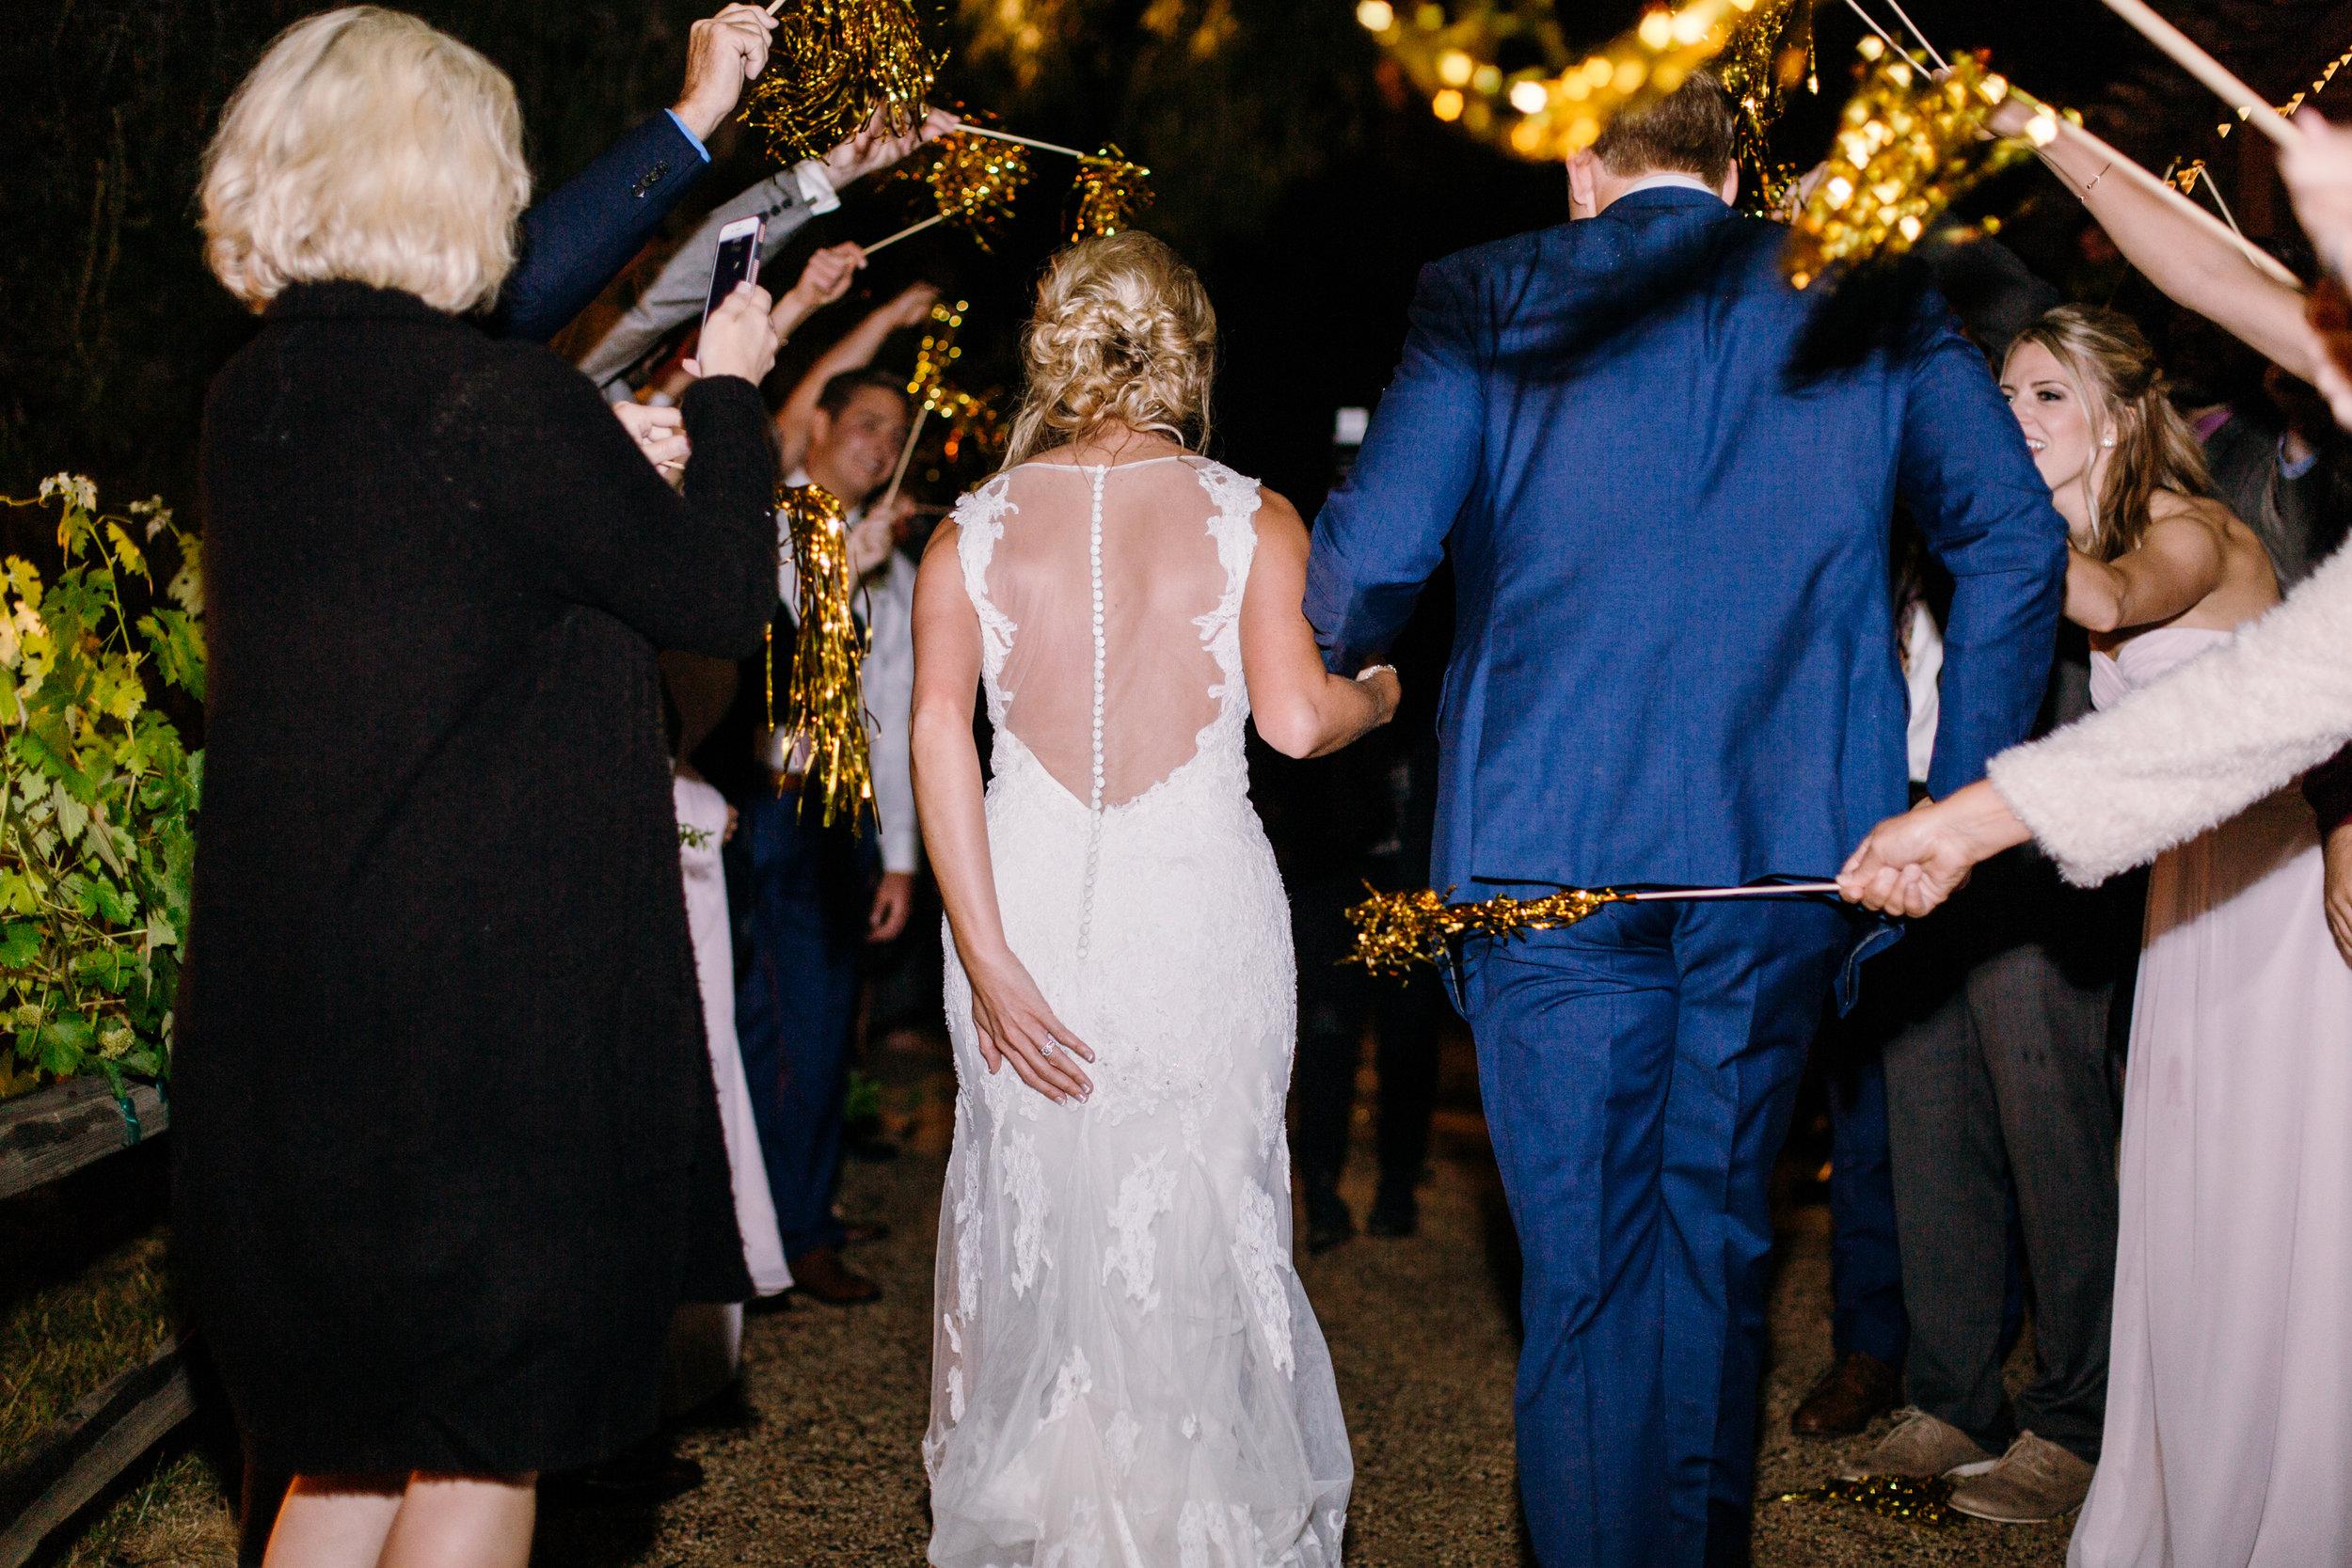 KaraNixonWeddings-LakeOakMeadows-Temecula-Wedding-57.jpg